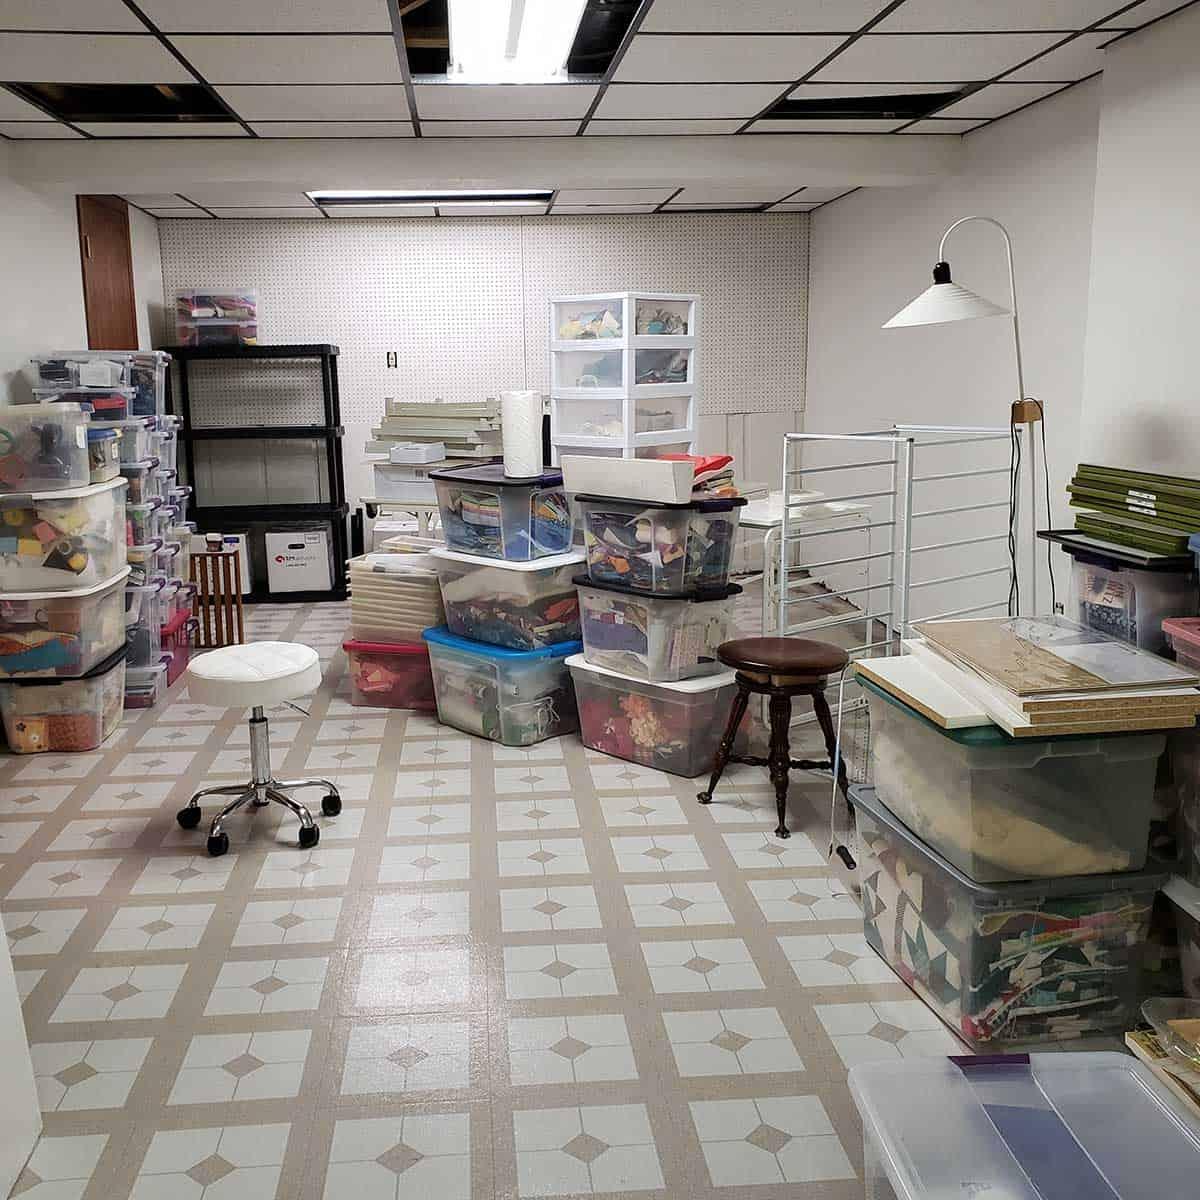 Moving into quilt studio